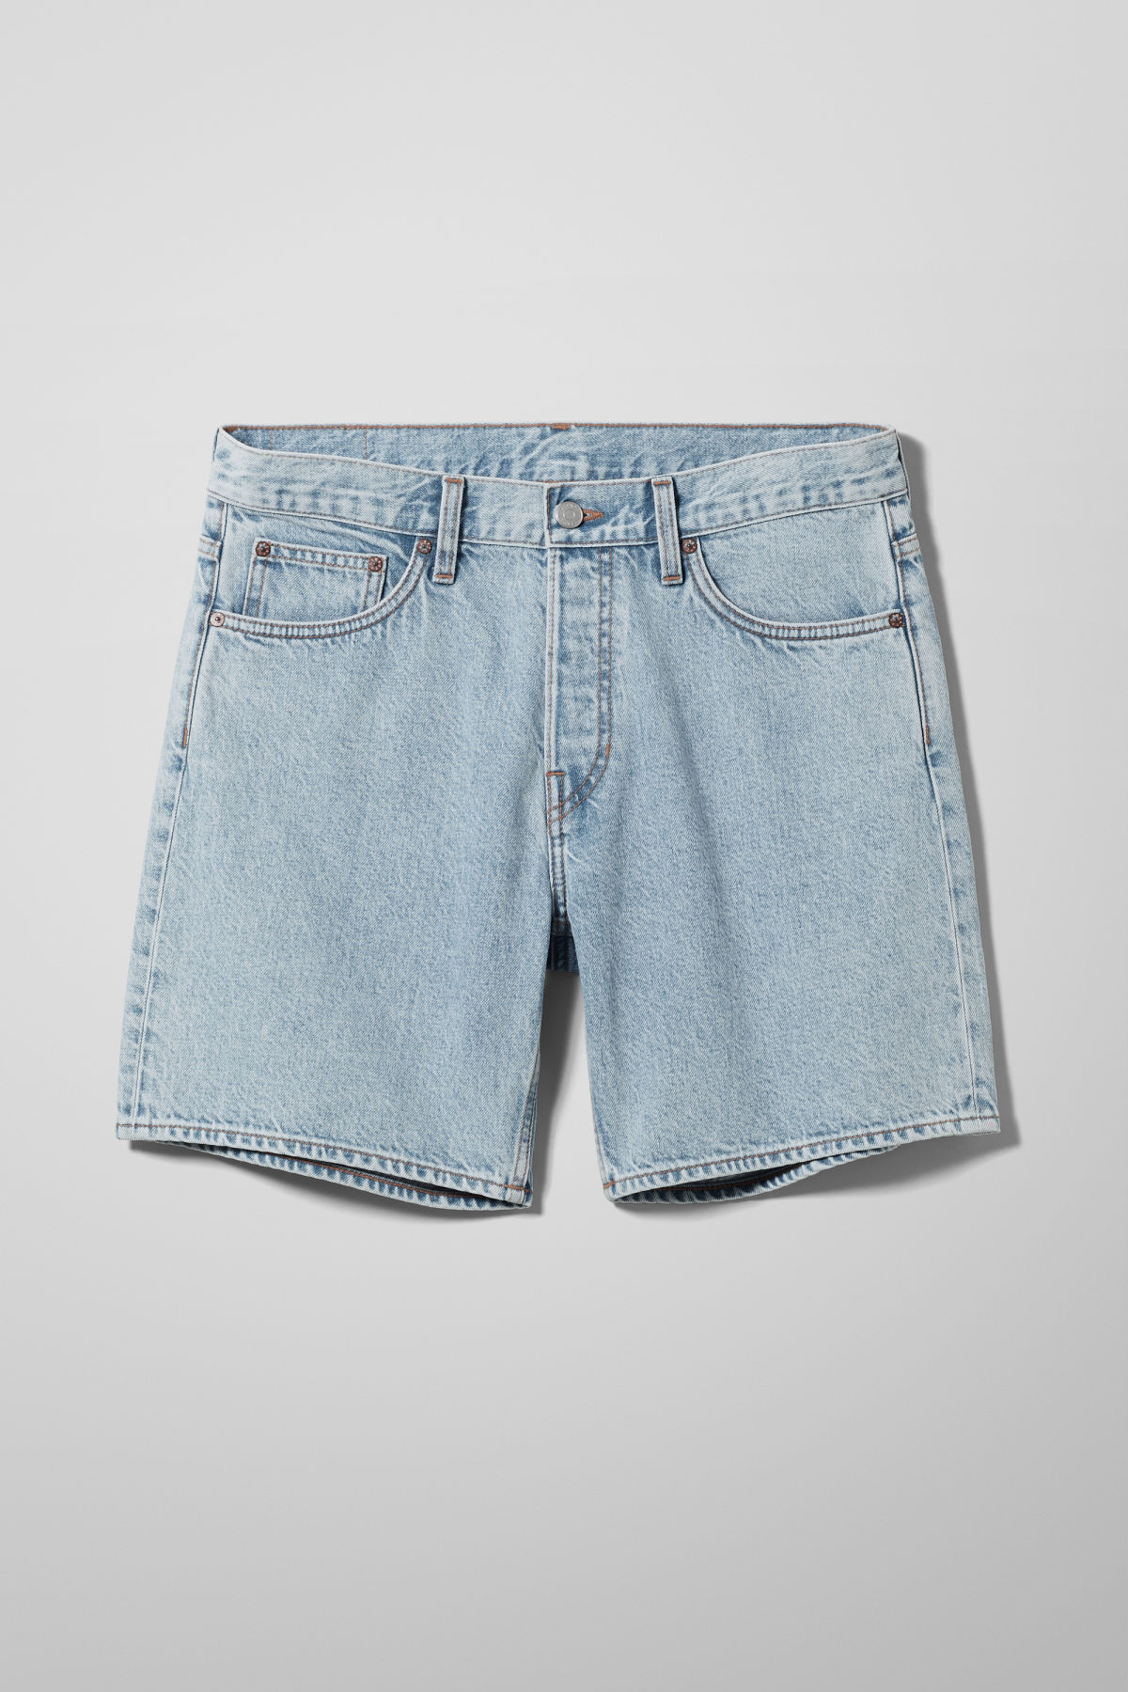 Vacant Denim Shorts - Blue